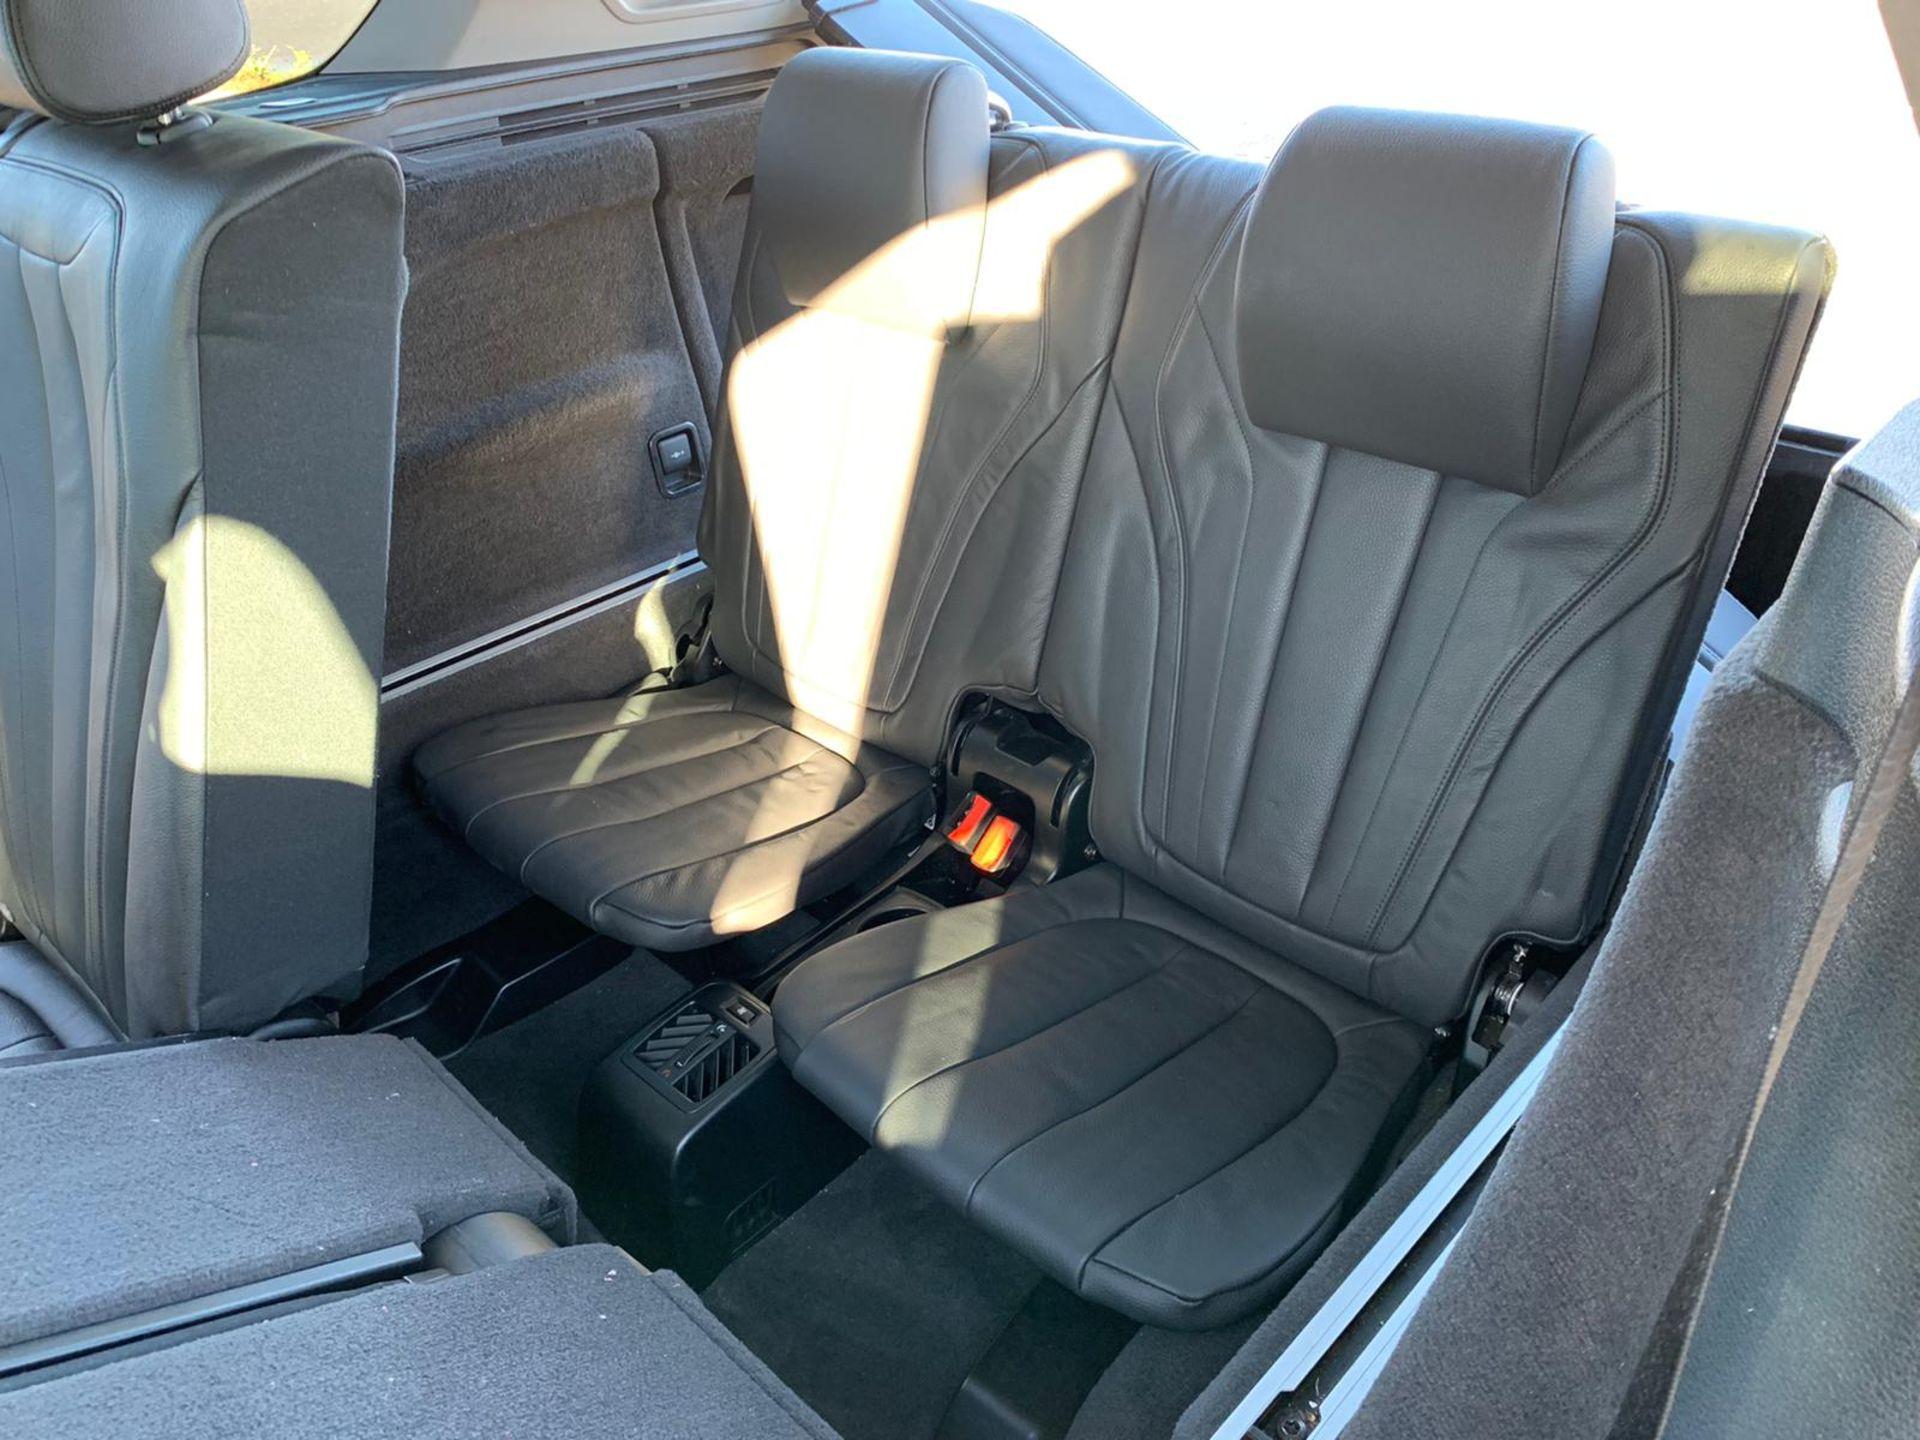 "(Reserve Met) BMW X5 2.0d S-DRIVE ""Special Equipment"" Auto- 7 Seater -16 Reg - Sat Nav- (New Shape) - Image 28 of 43"